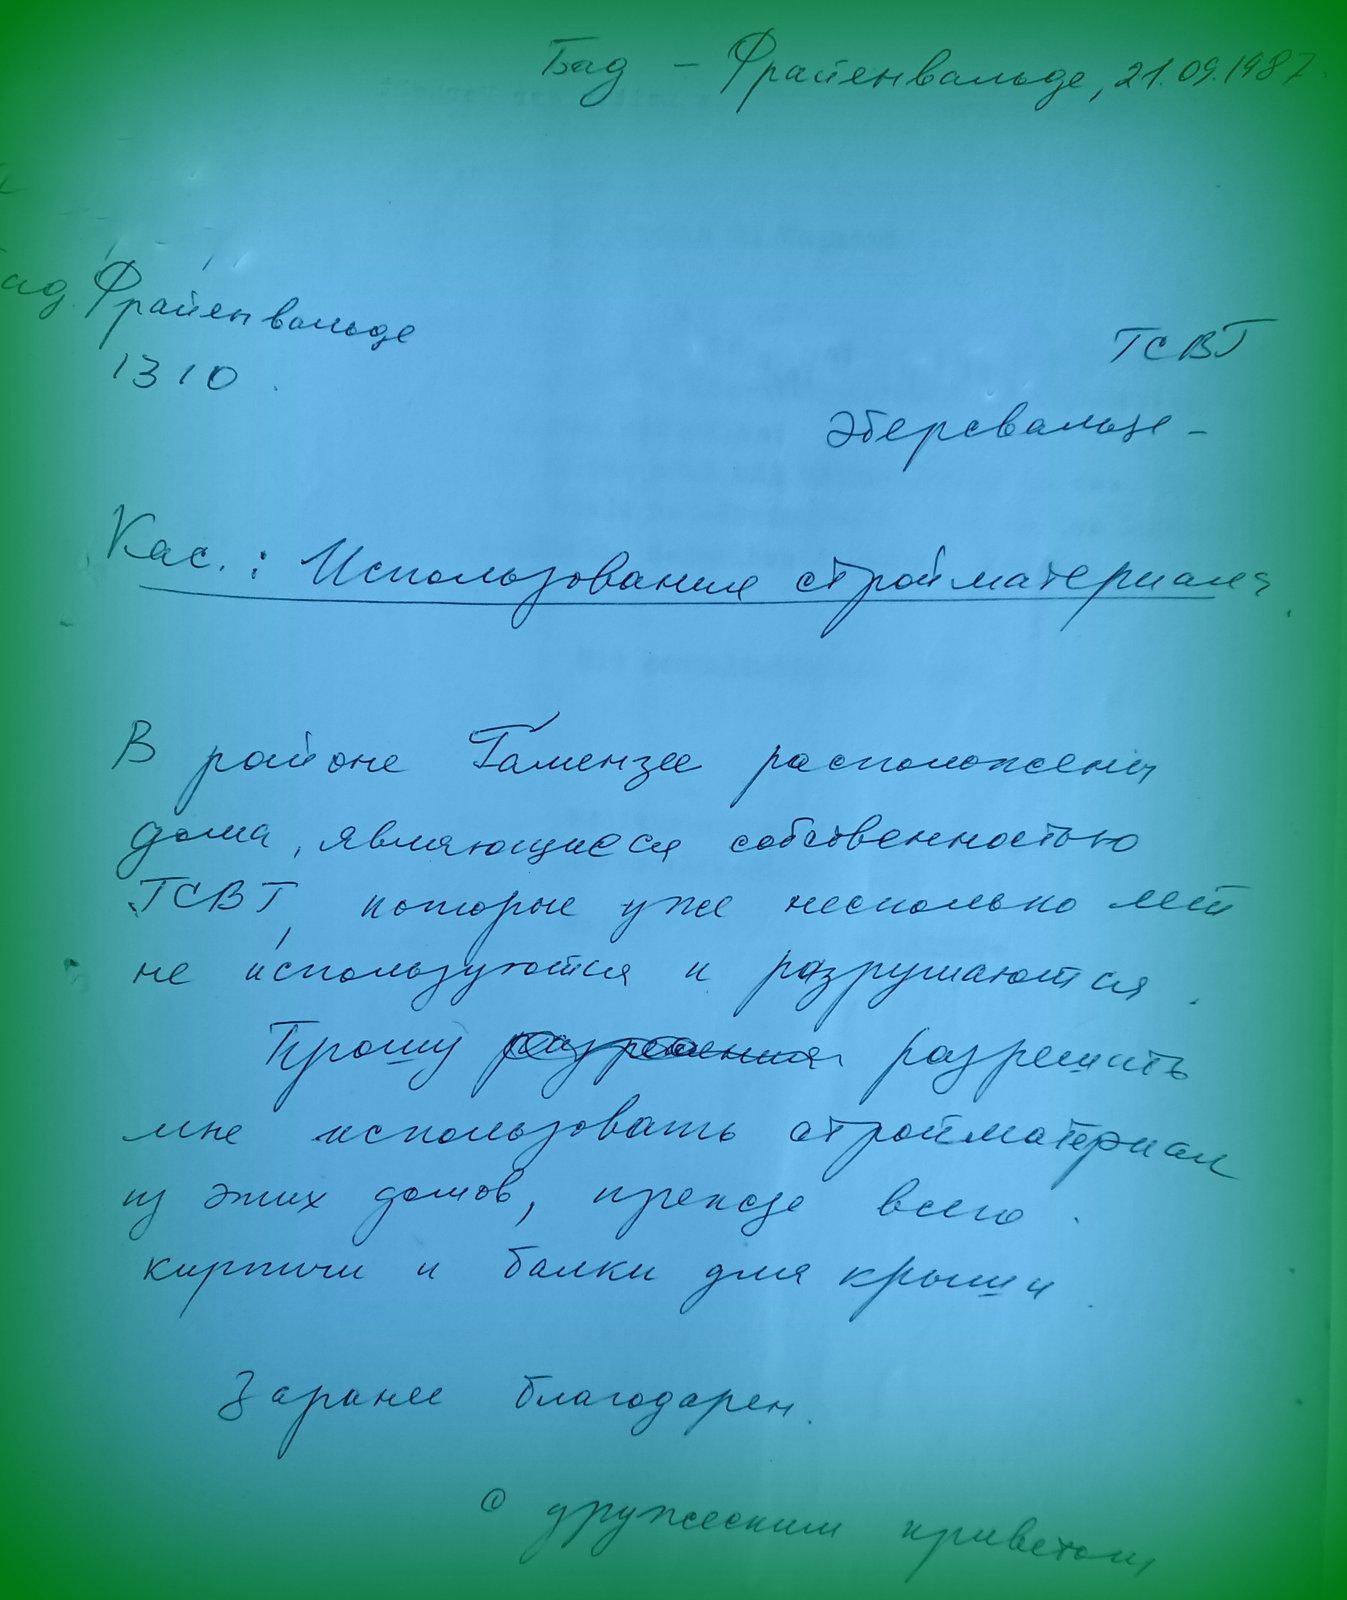 http://st0.forum4.ru/uploads/0009/6c/04/1355/715928.jpg